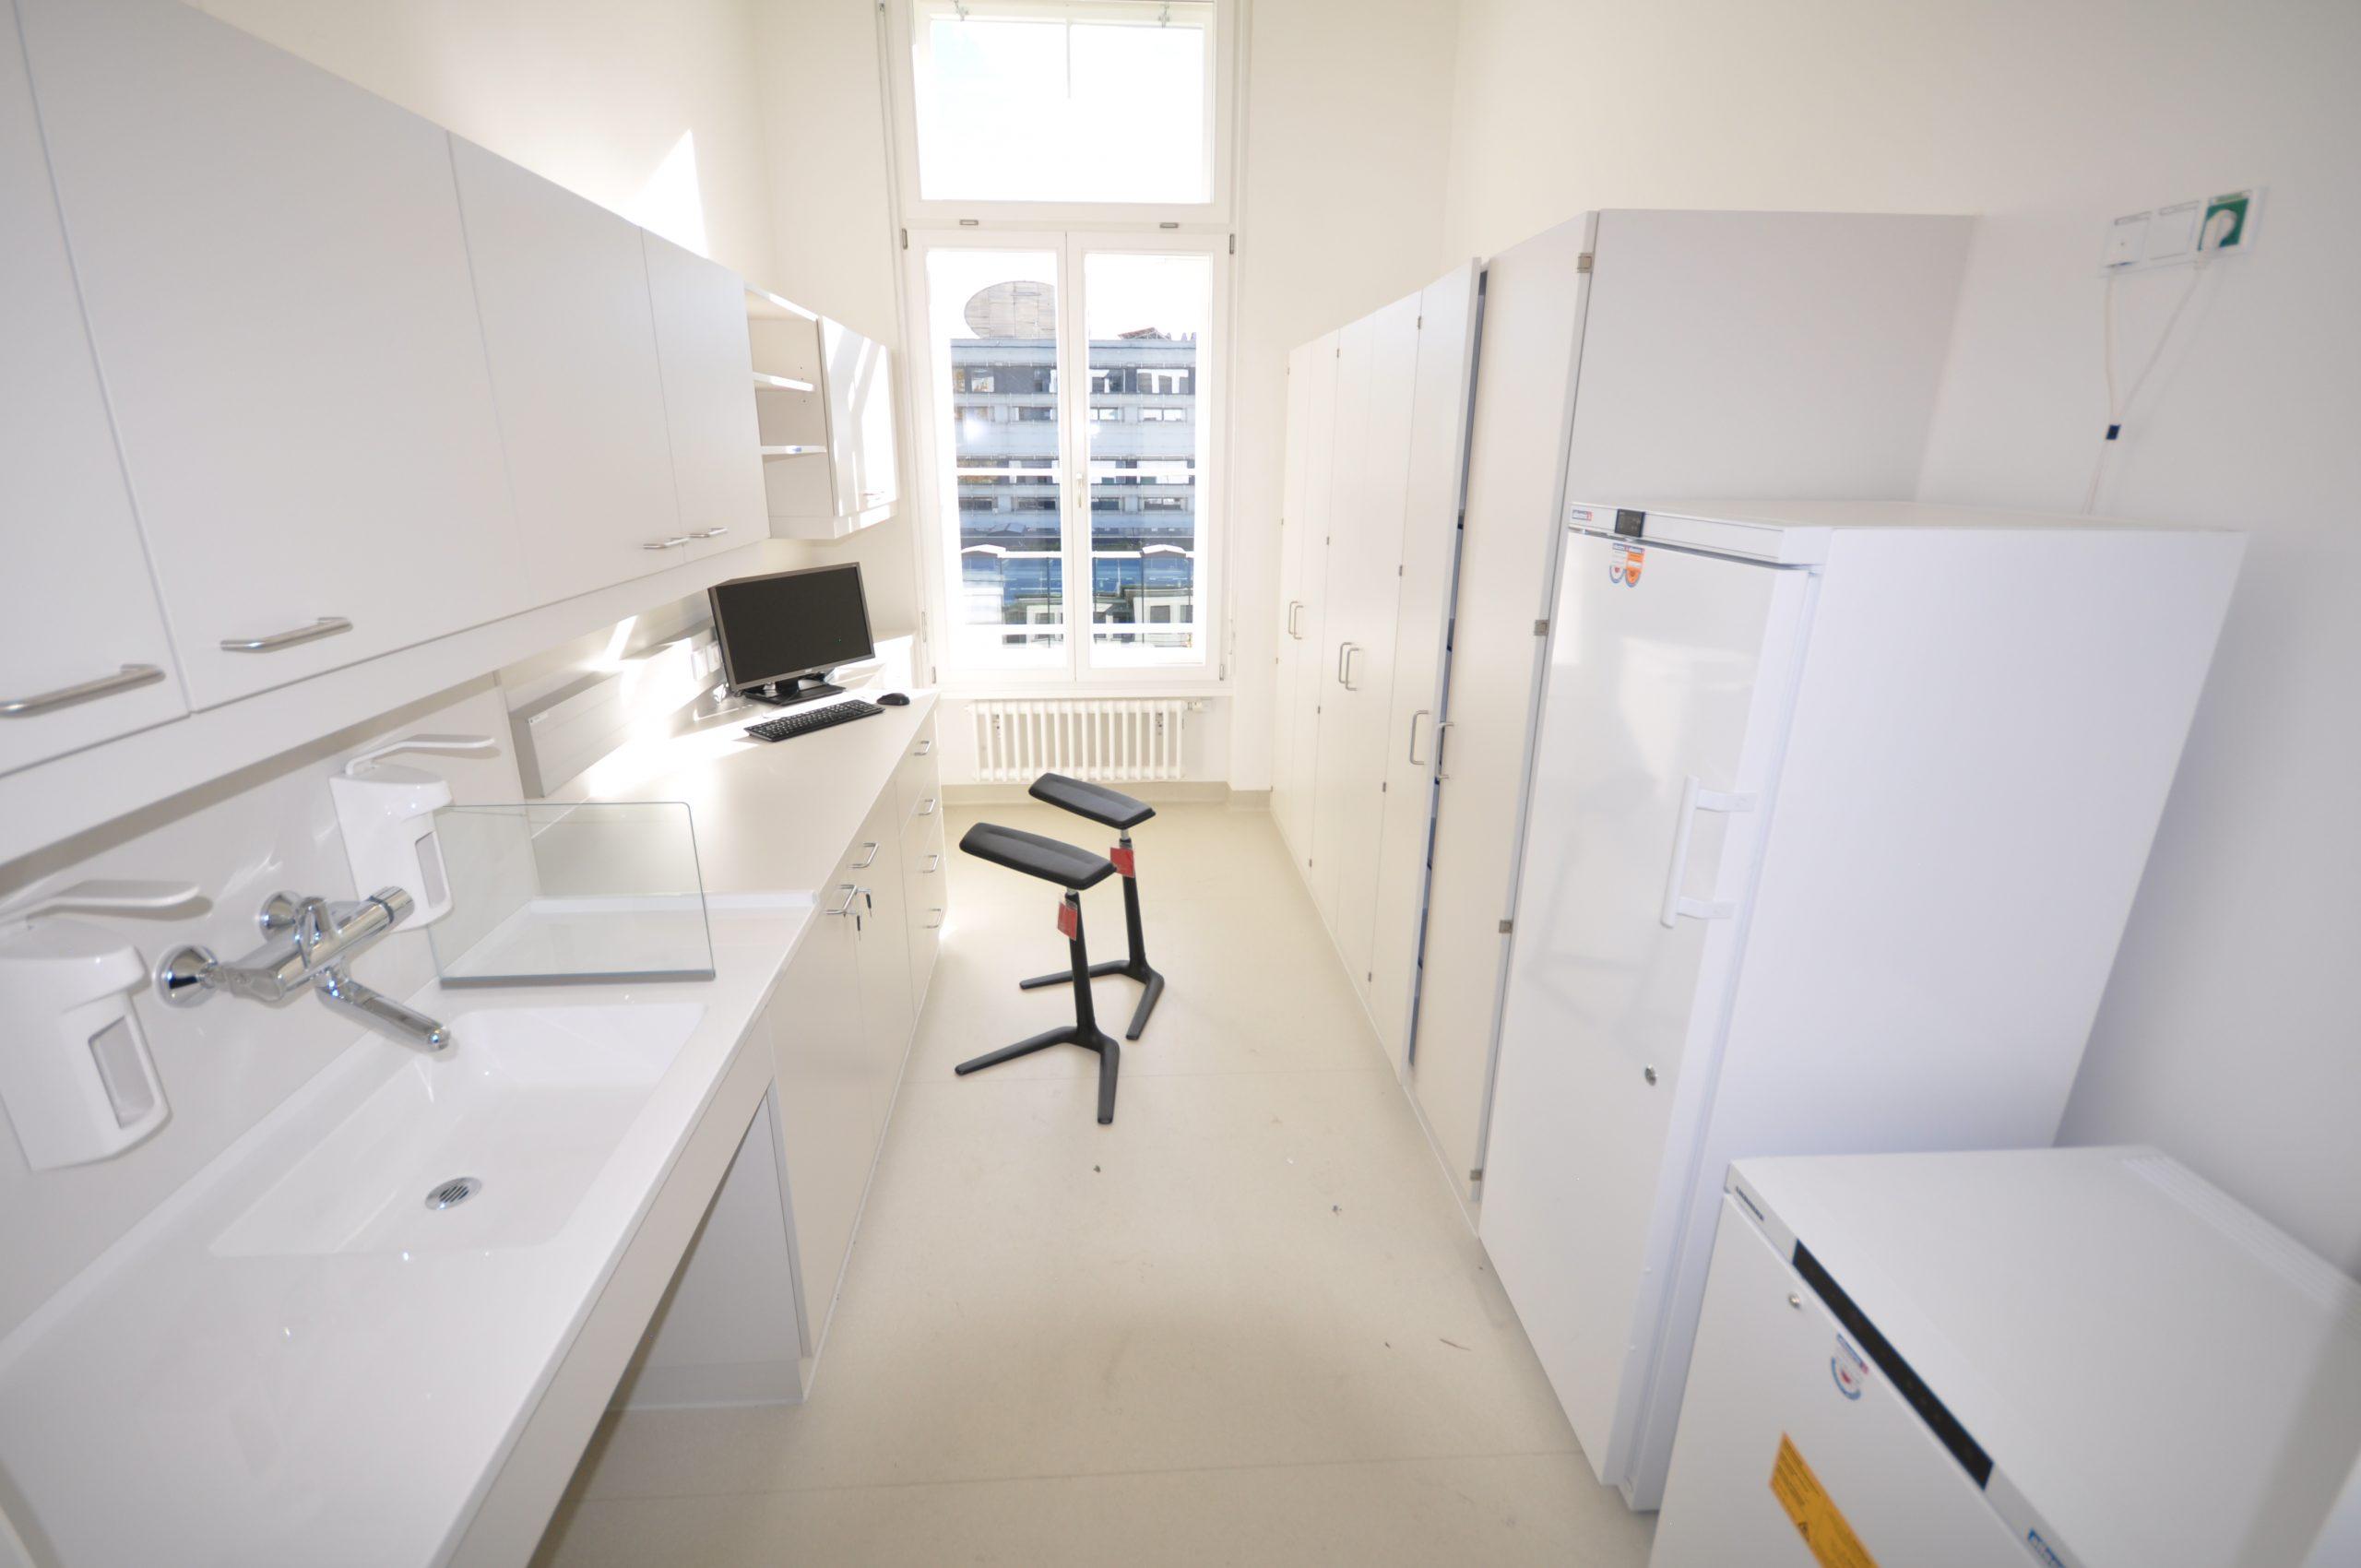 LKH Graz Hämatologie-Ambulanz Medikamentenraum